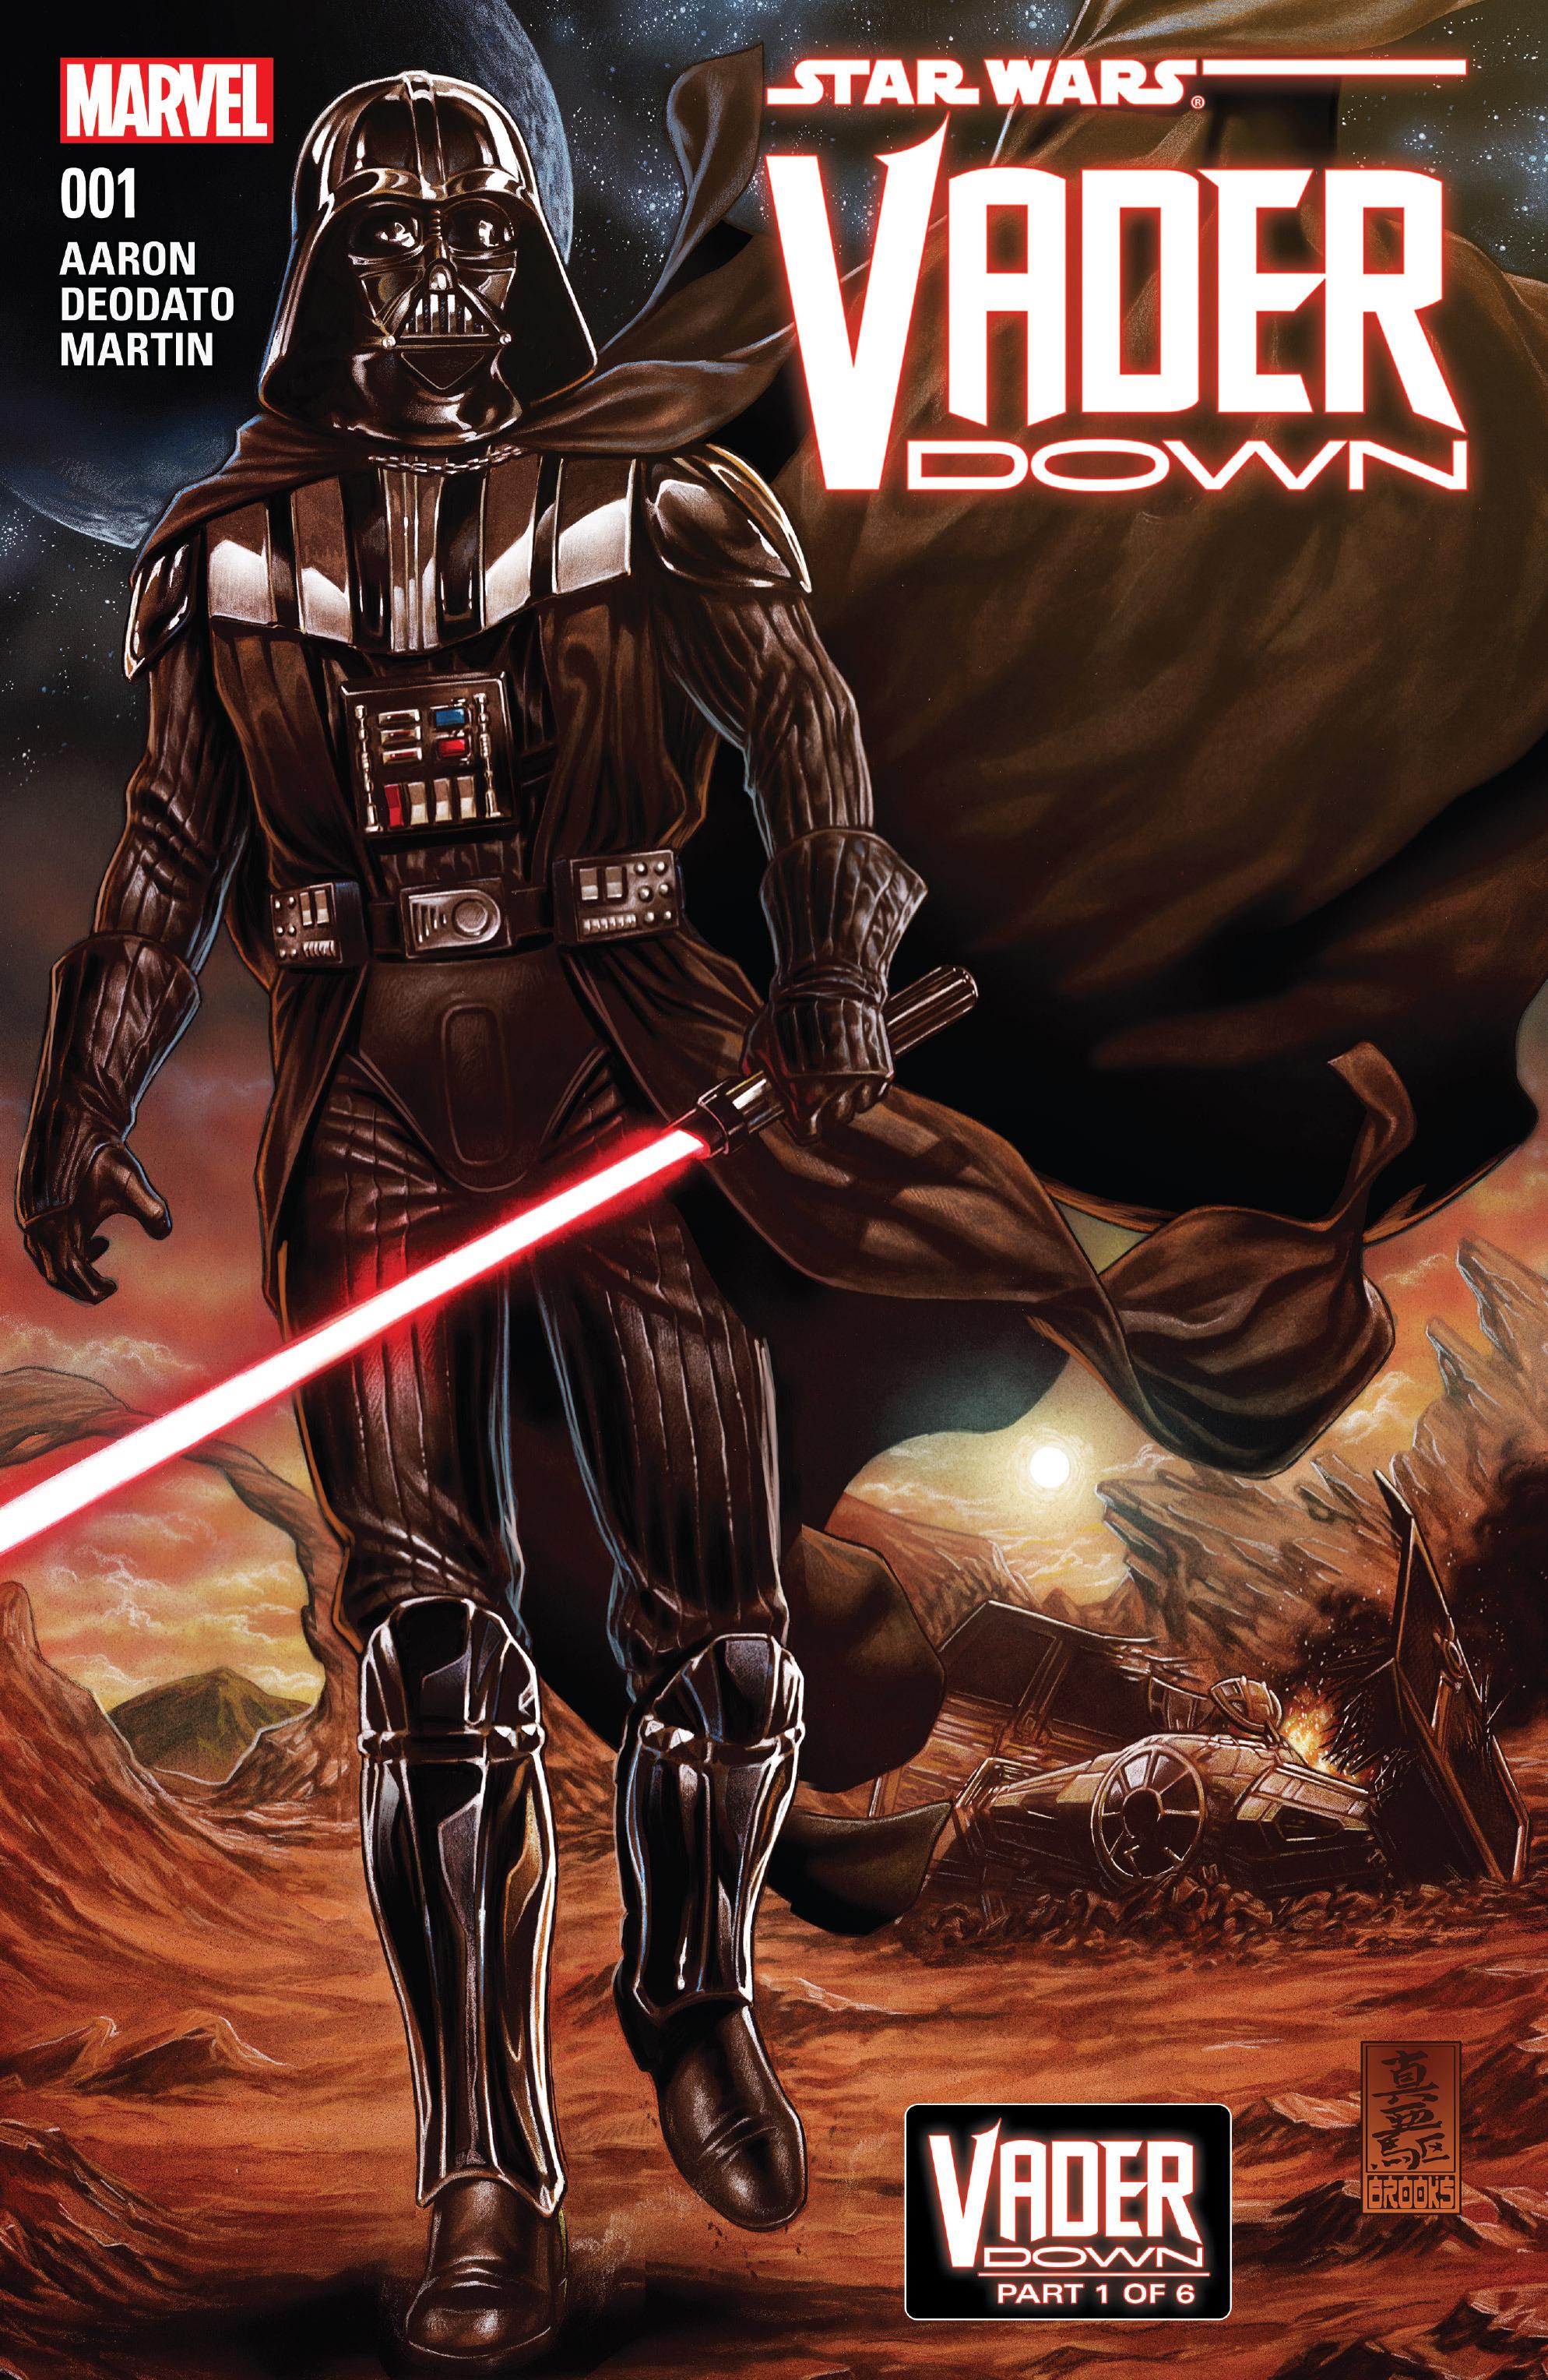 Star Wars: Vader Down Full Page 1